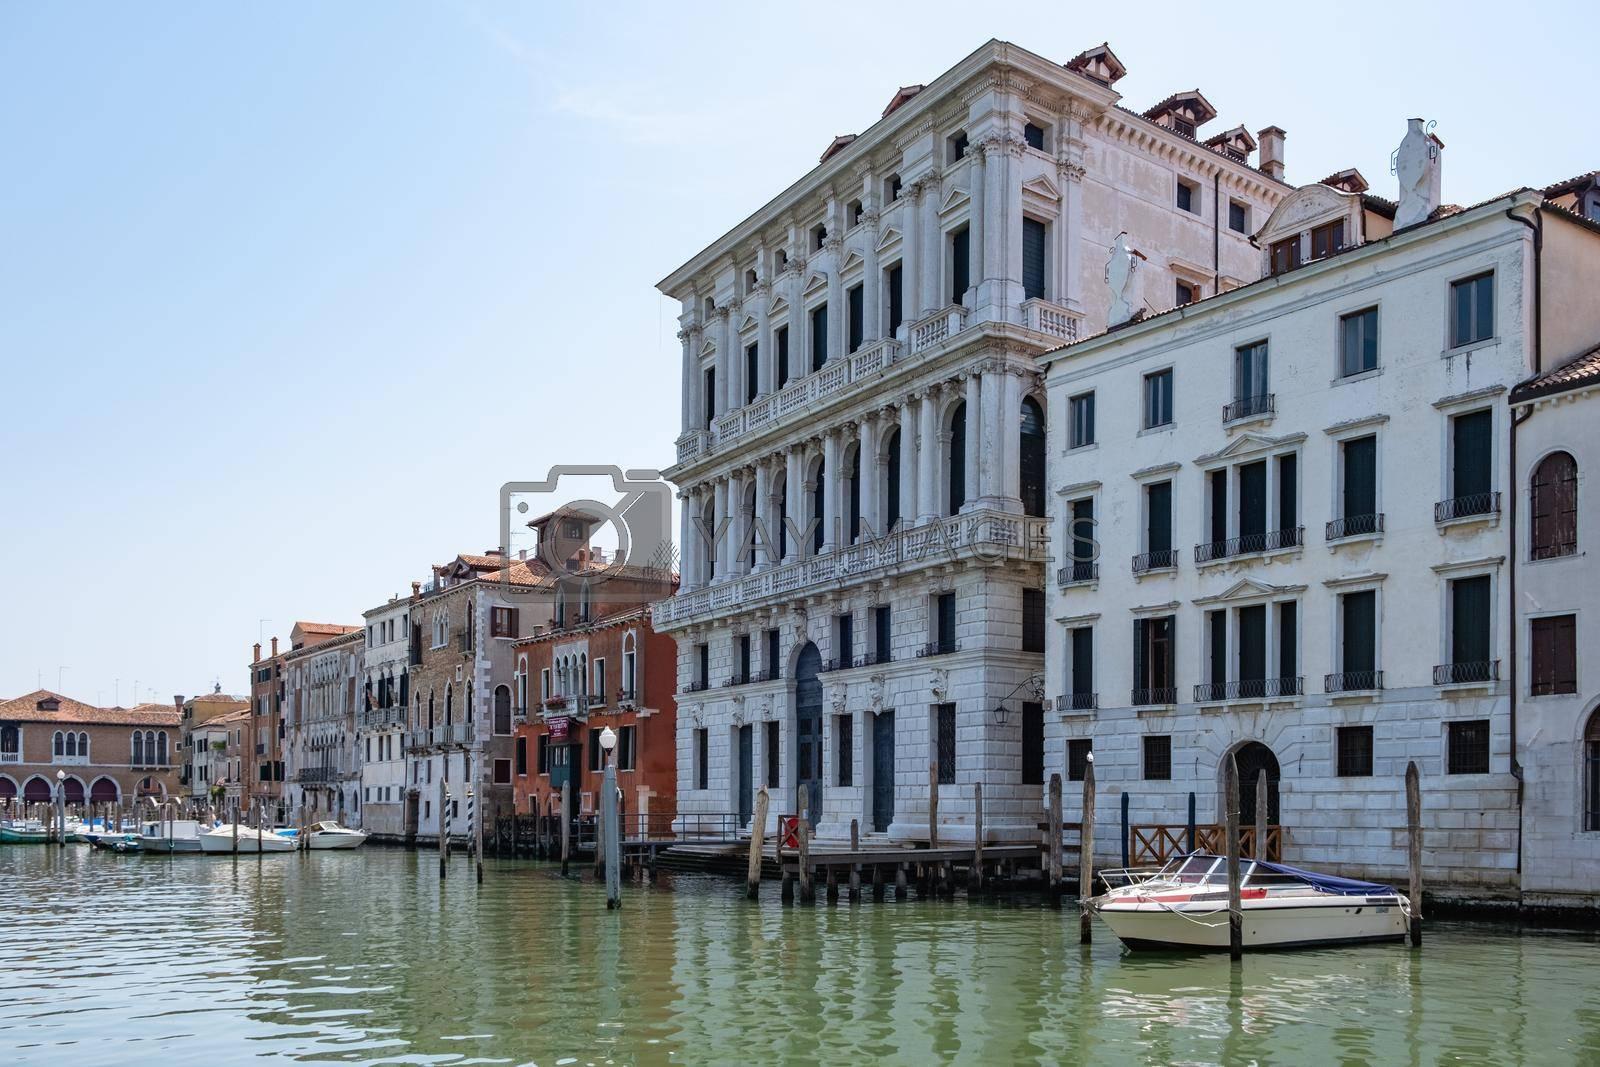 Beautiful venetian street in summer day, Italy. Venice Europe